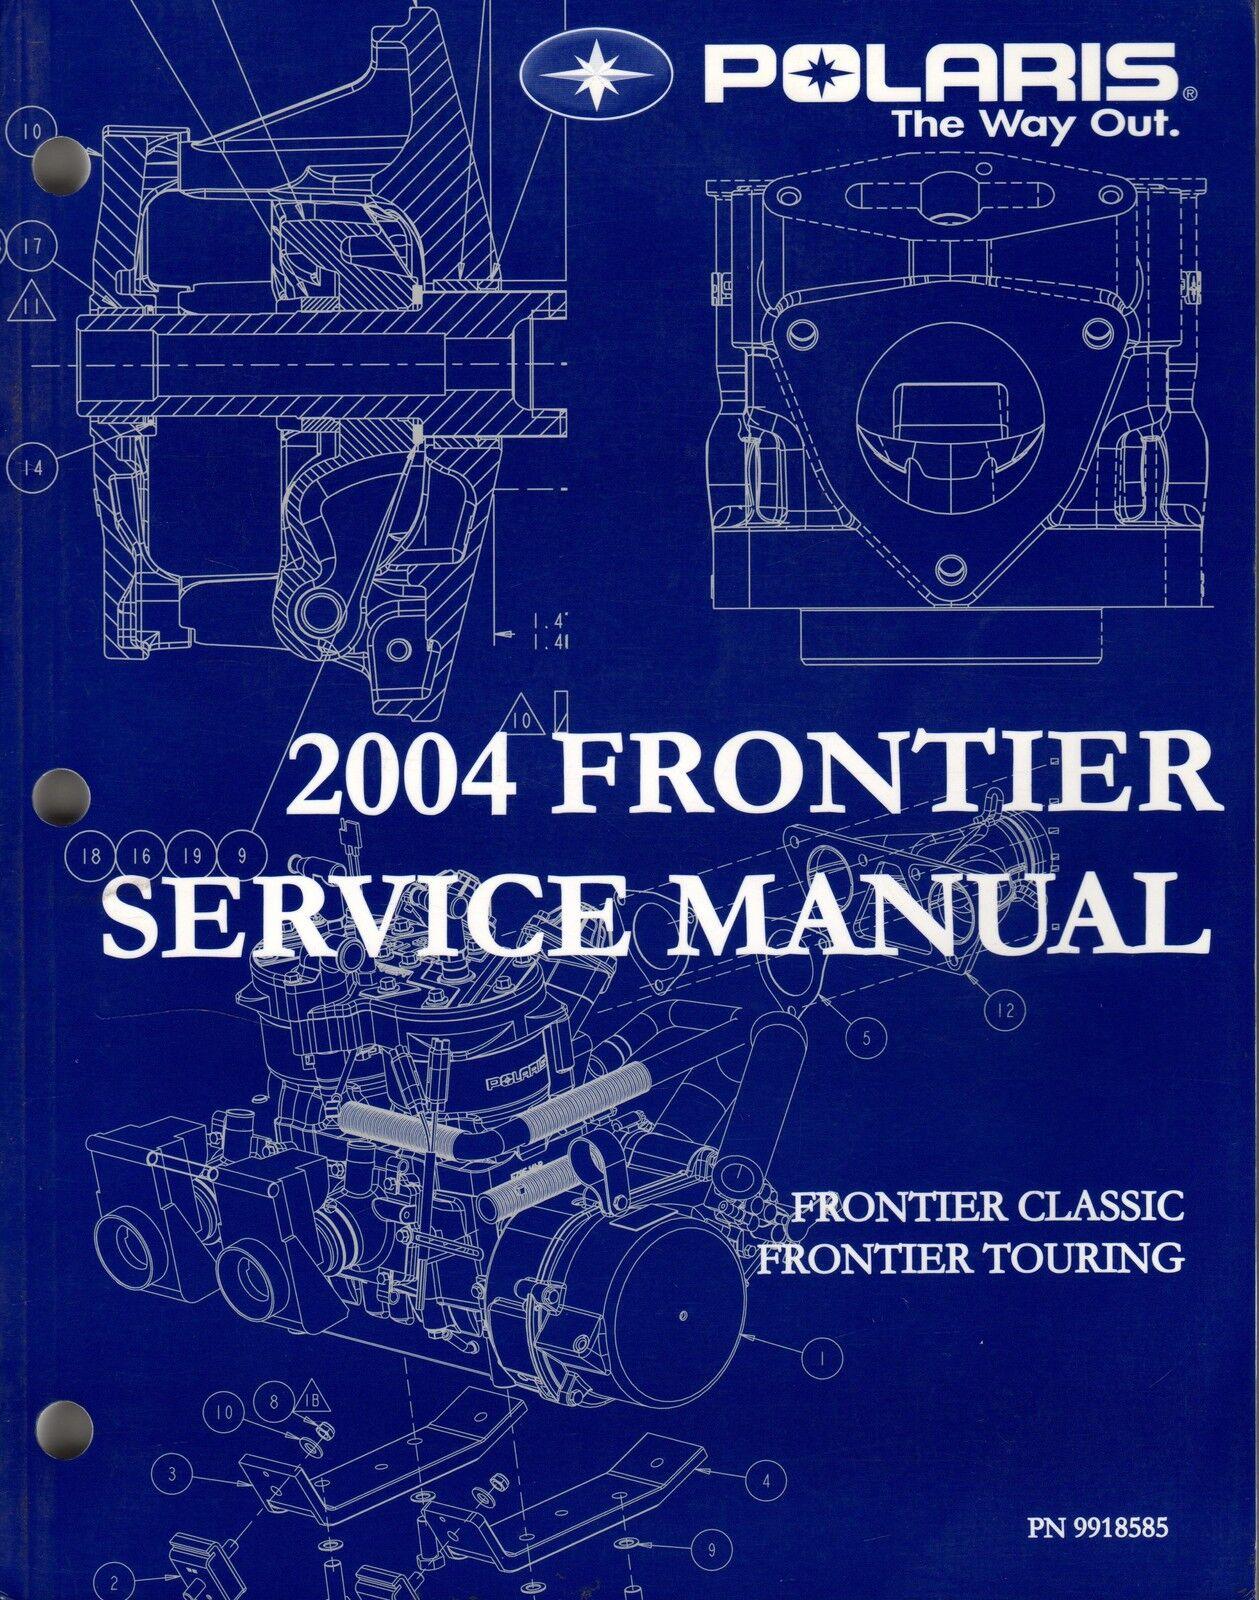 2004 POLARIS SNOWMOBILE FRONTIER SERVICE MANUAL P N 9918585 (664)